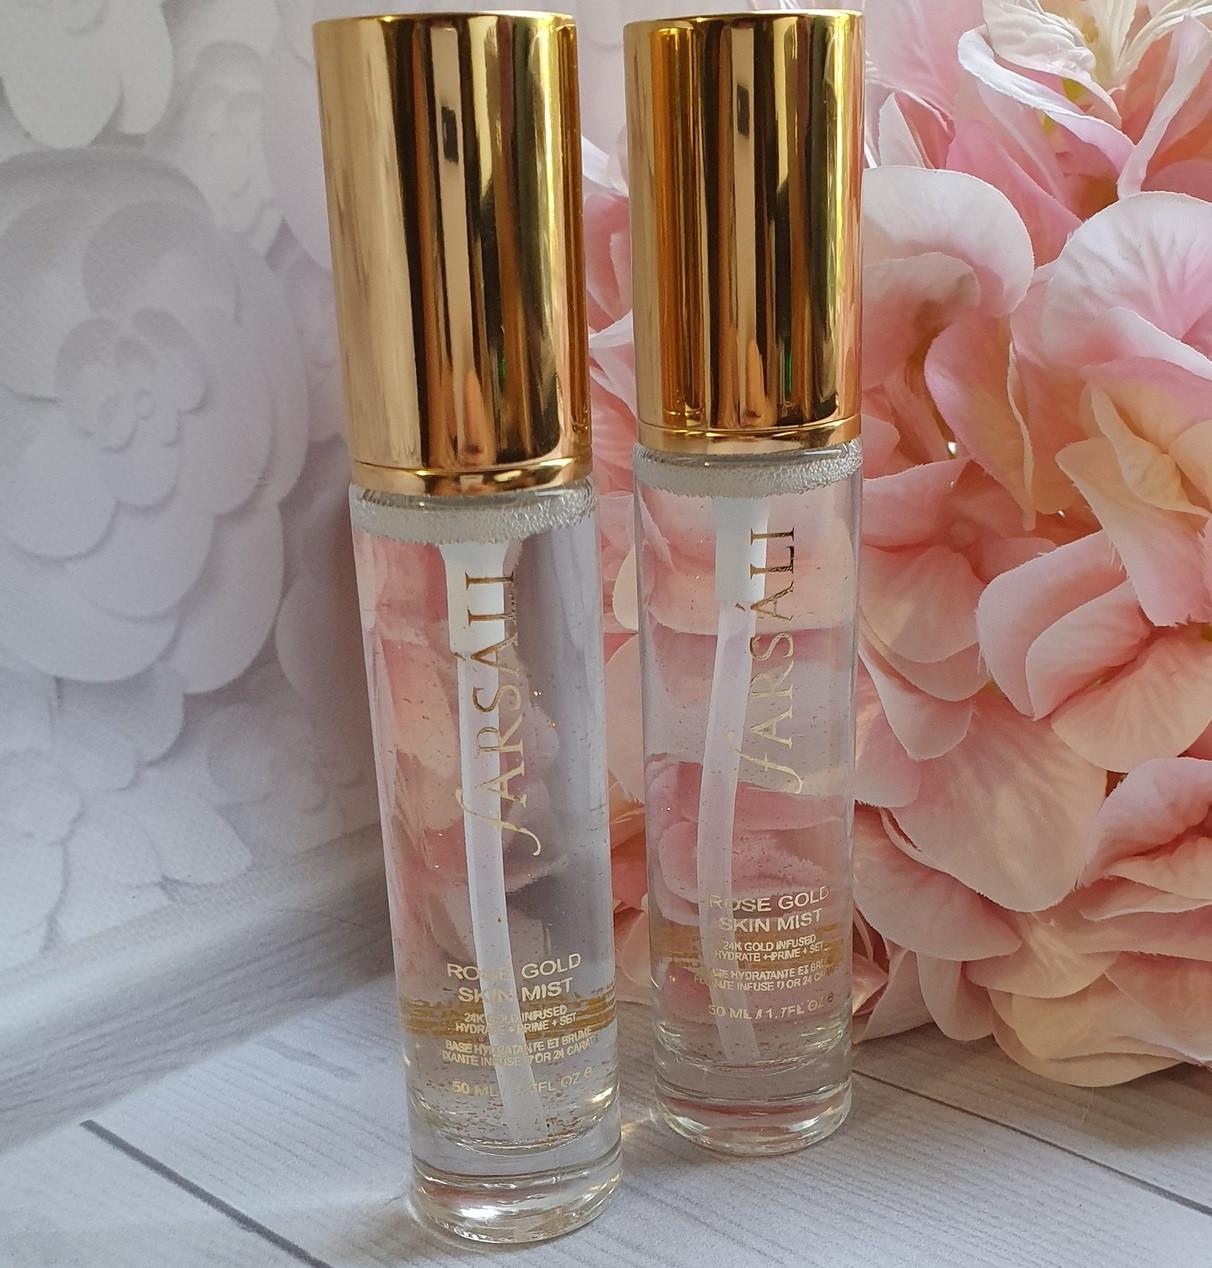 Спрей-мист для лица FARSALI Rose Gold 24K Skin Mist (фиксация макияжа, праймер и увлажнение) 50 мл